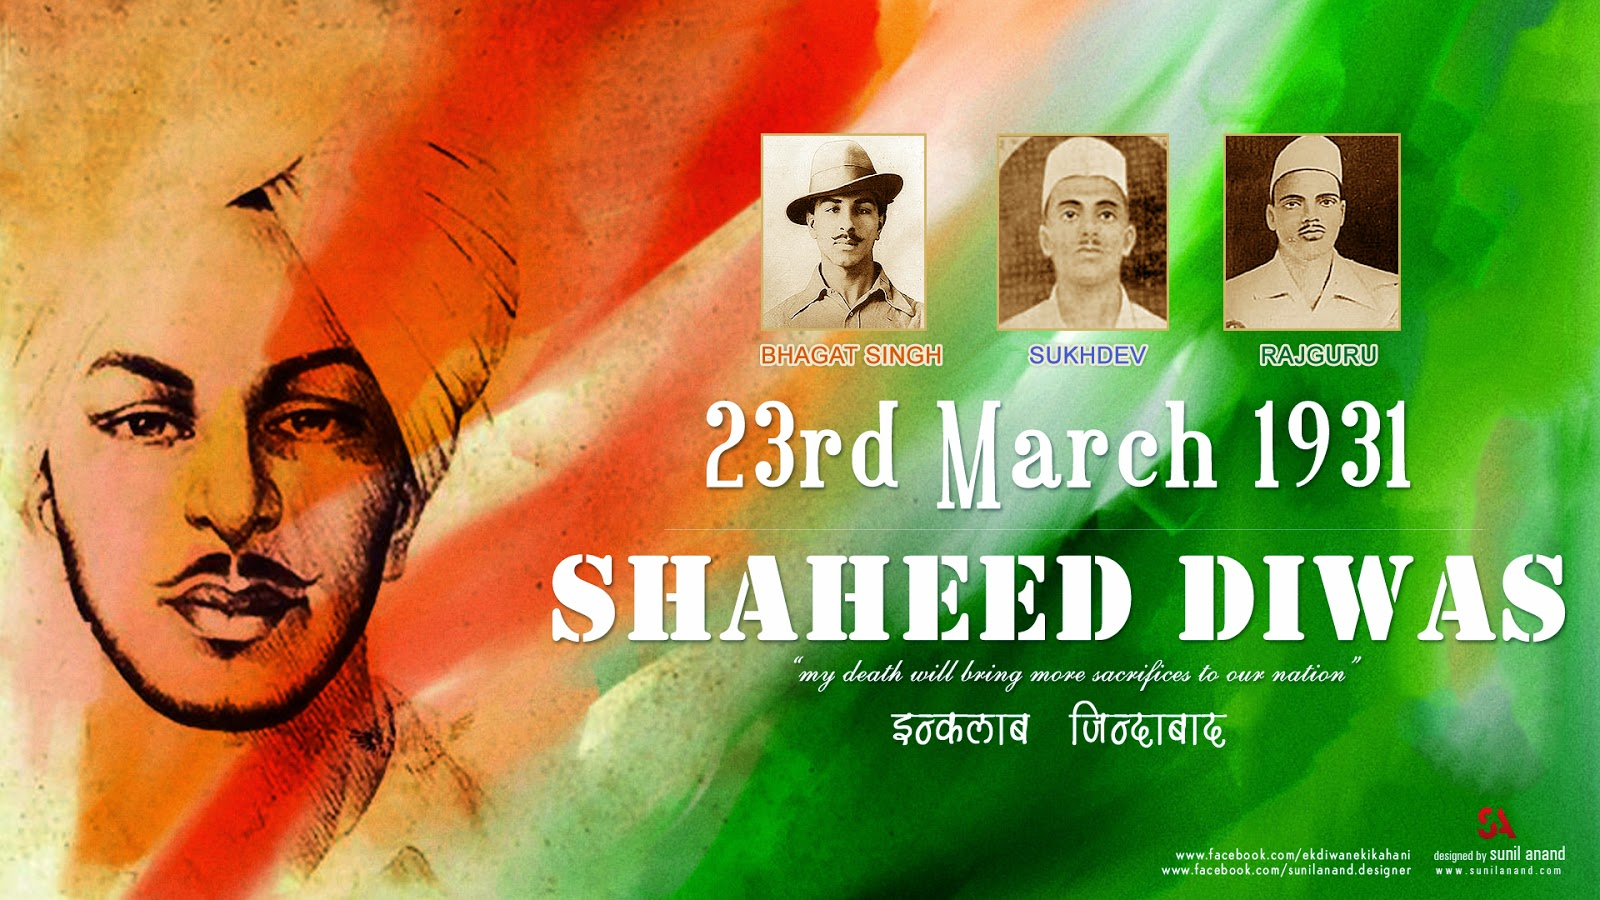 Ek Diwane Ki Kahani 23rd March Shaheed Diwas Wallpaper By Sunil Anand